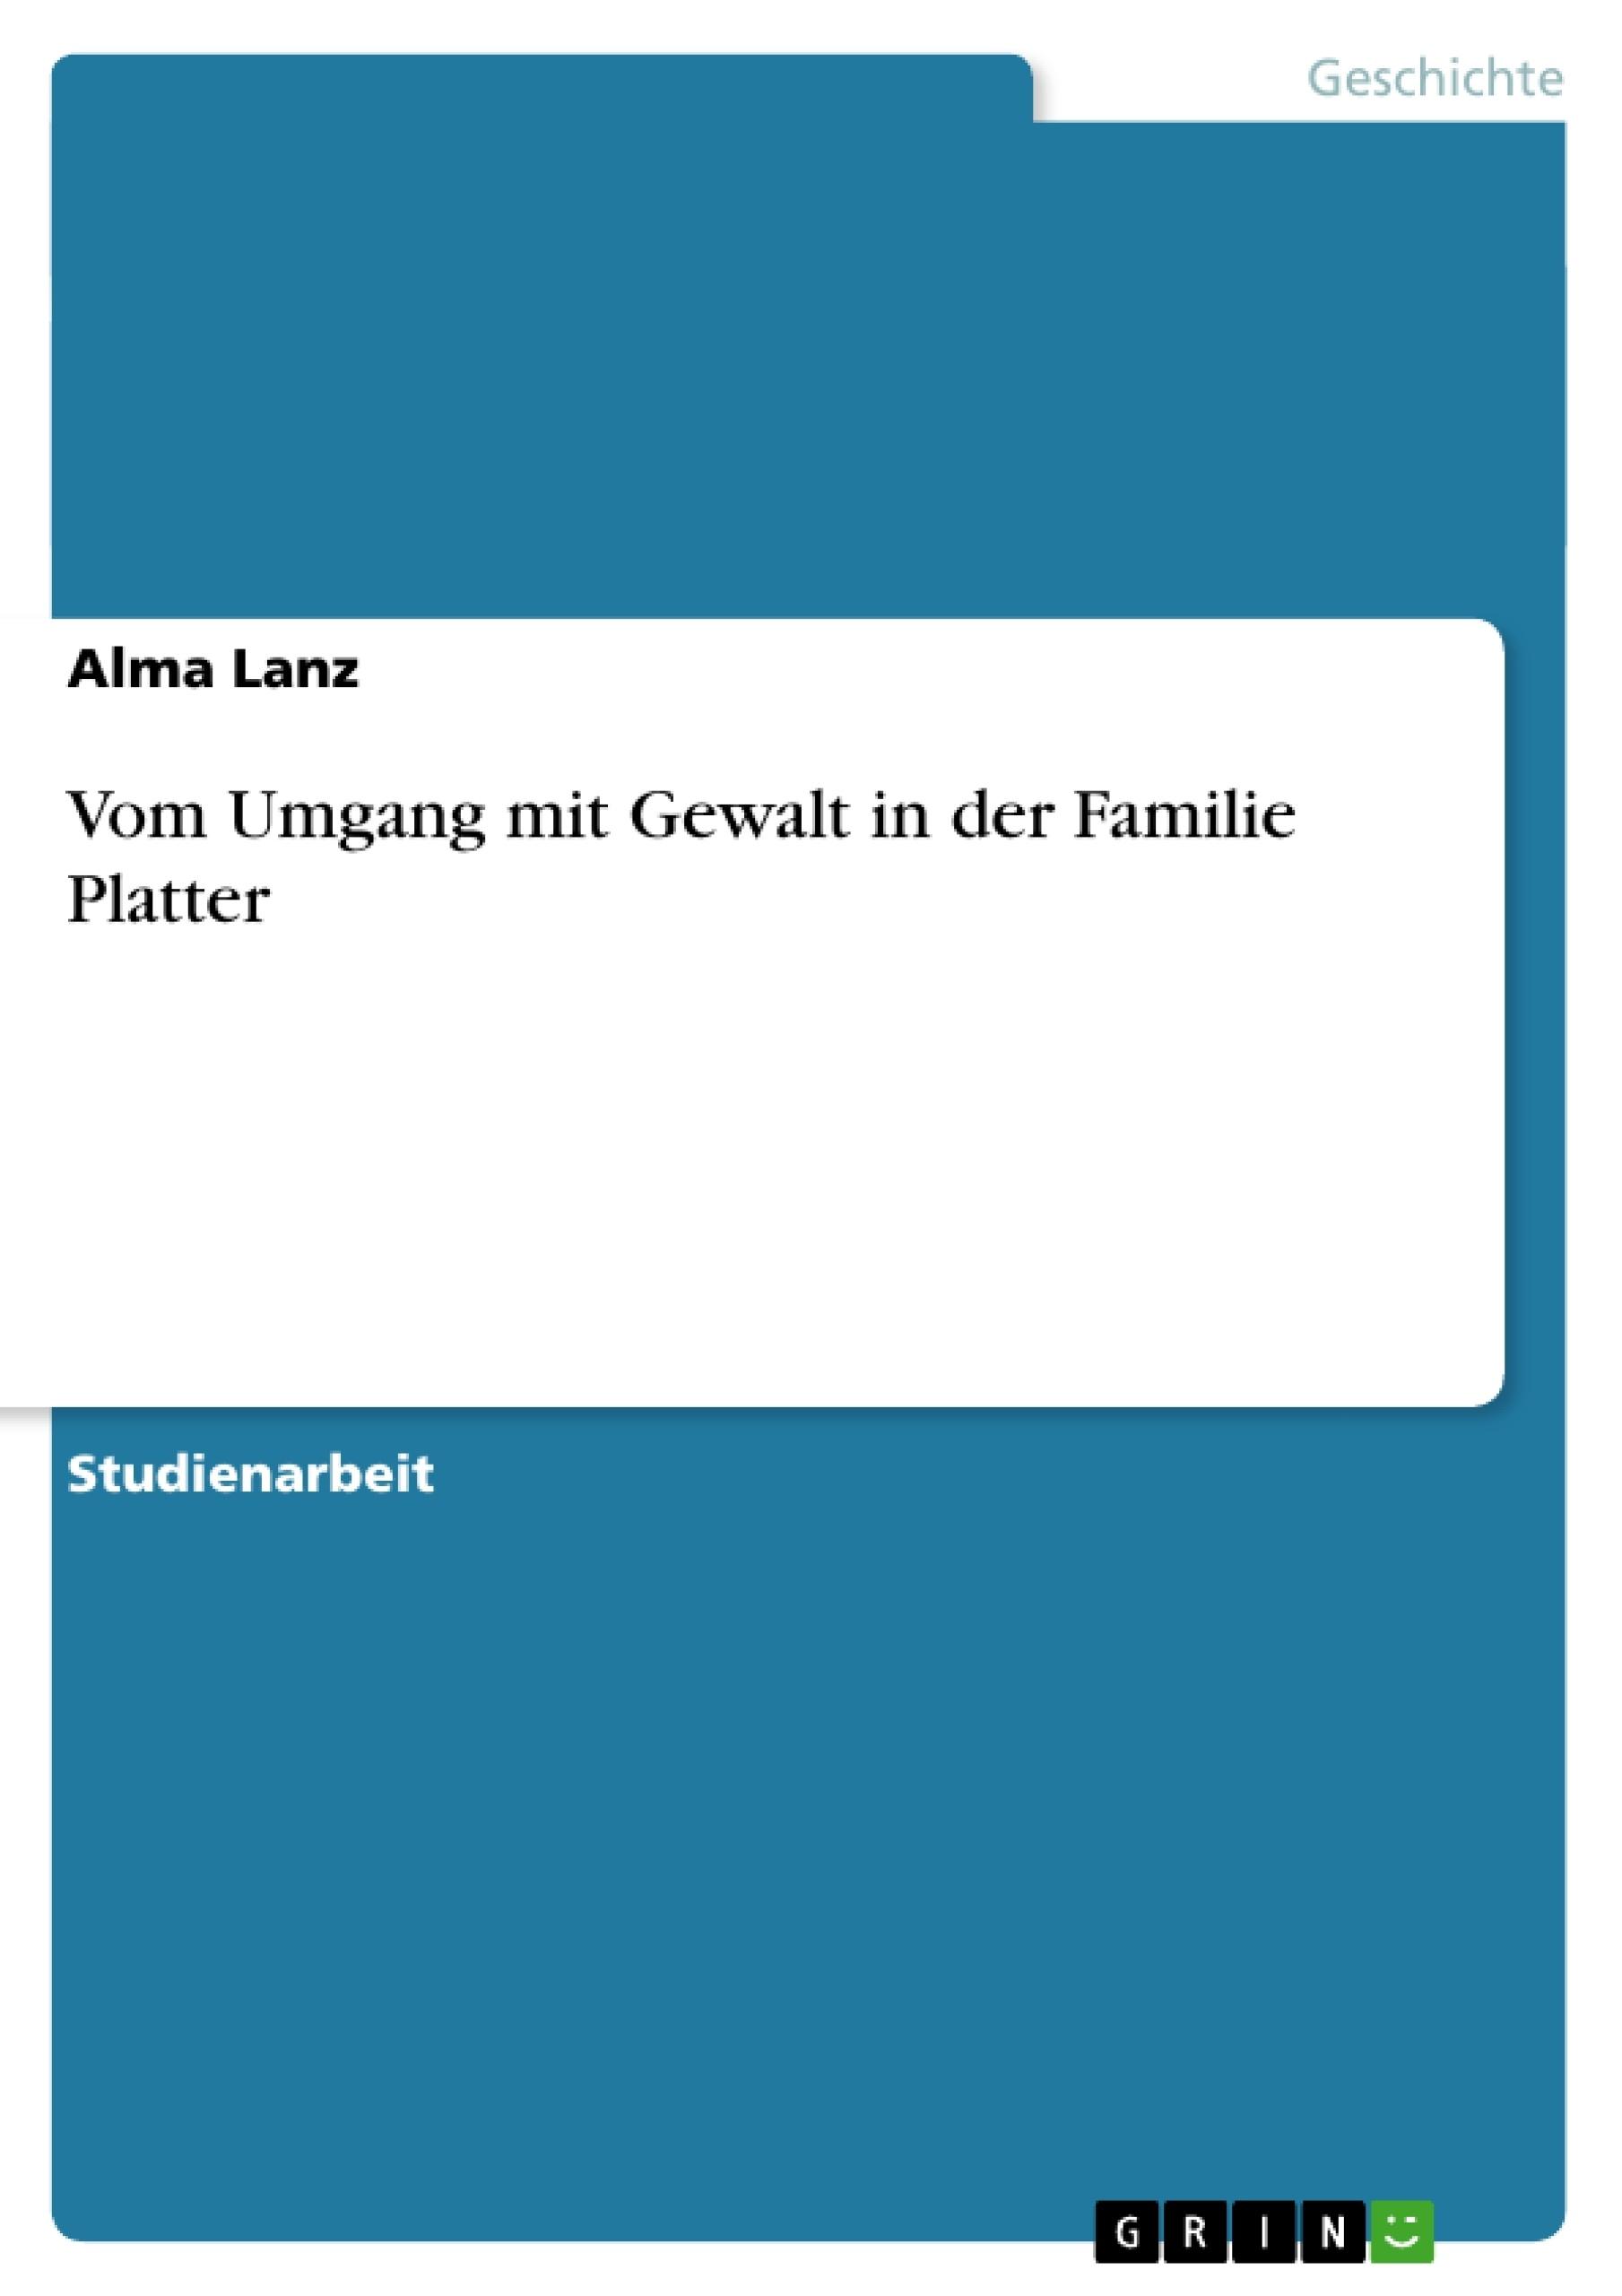 Titel: Vom Umgang mit Gewalt in der Familie Platter